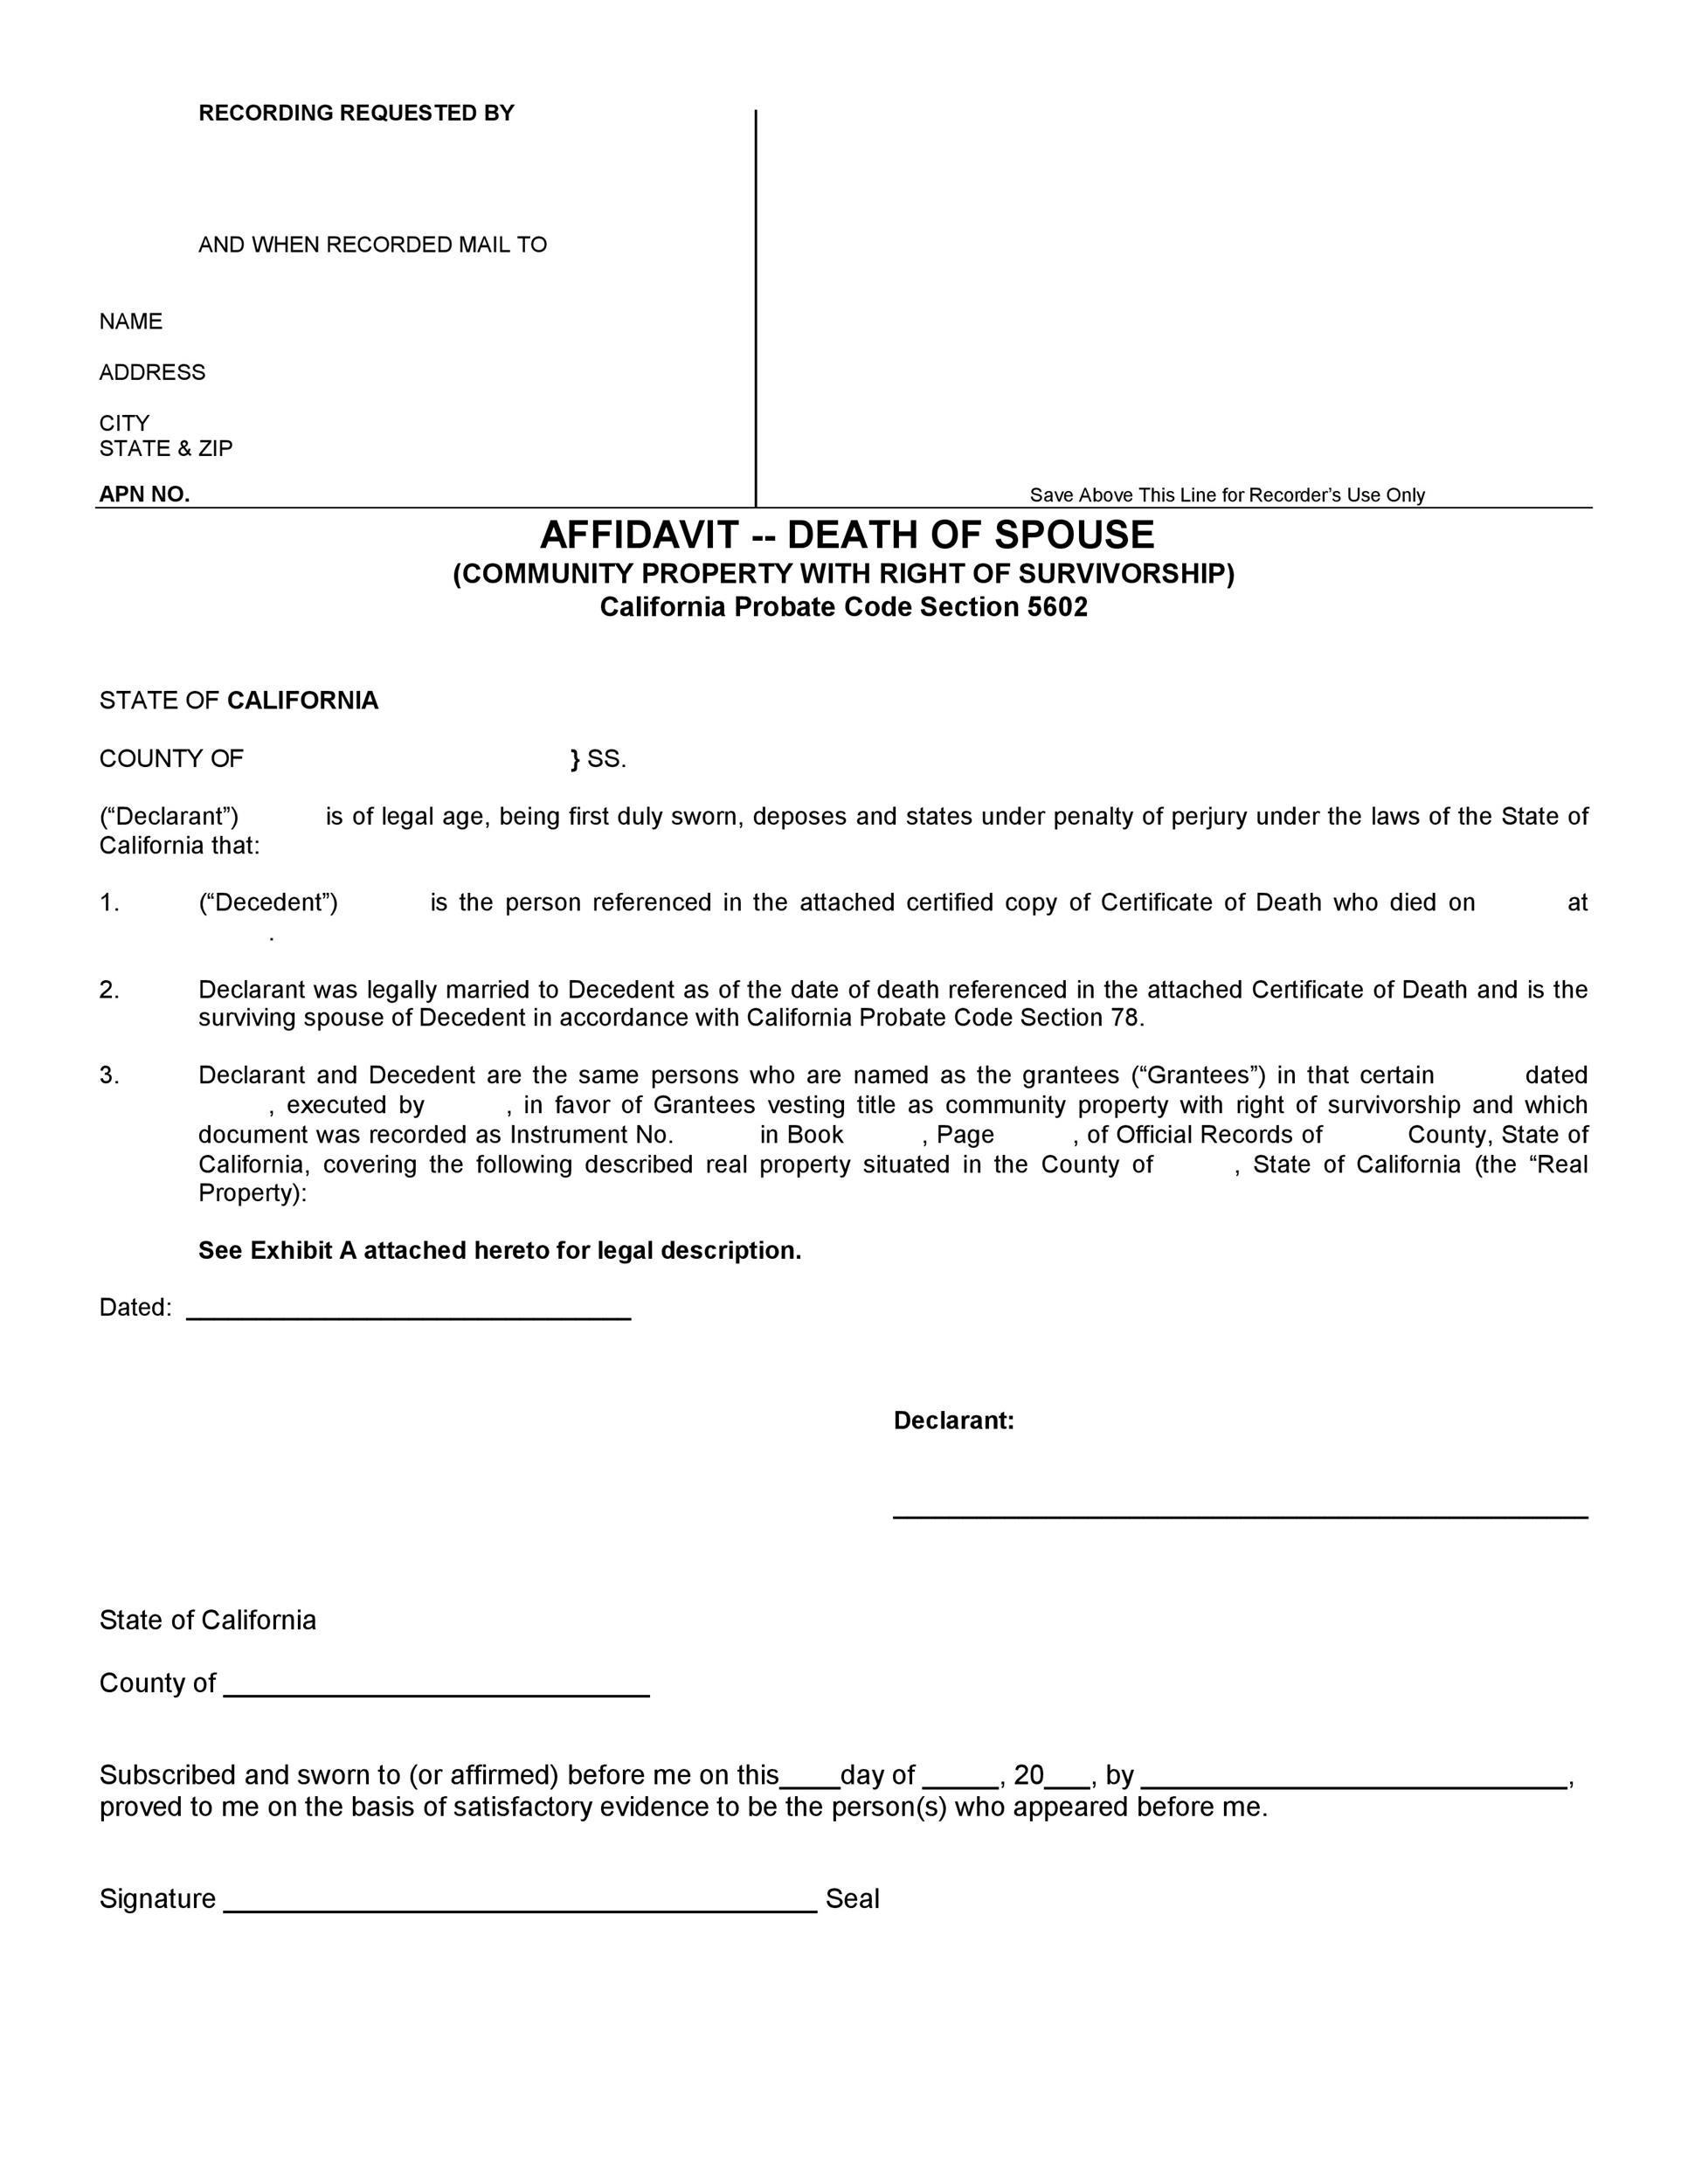 Free affidavit of death 08